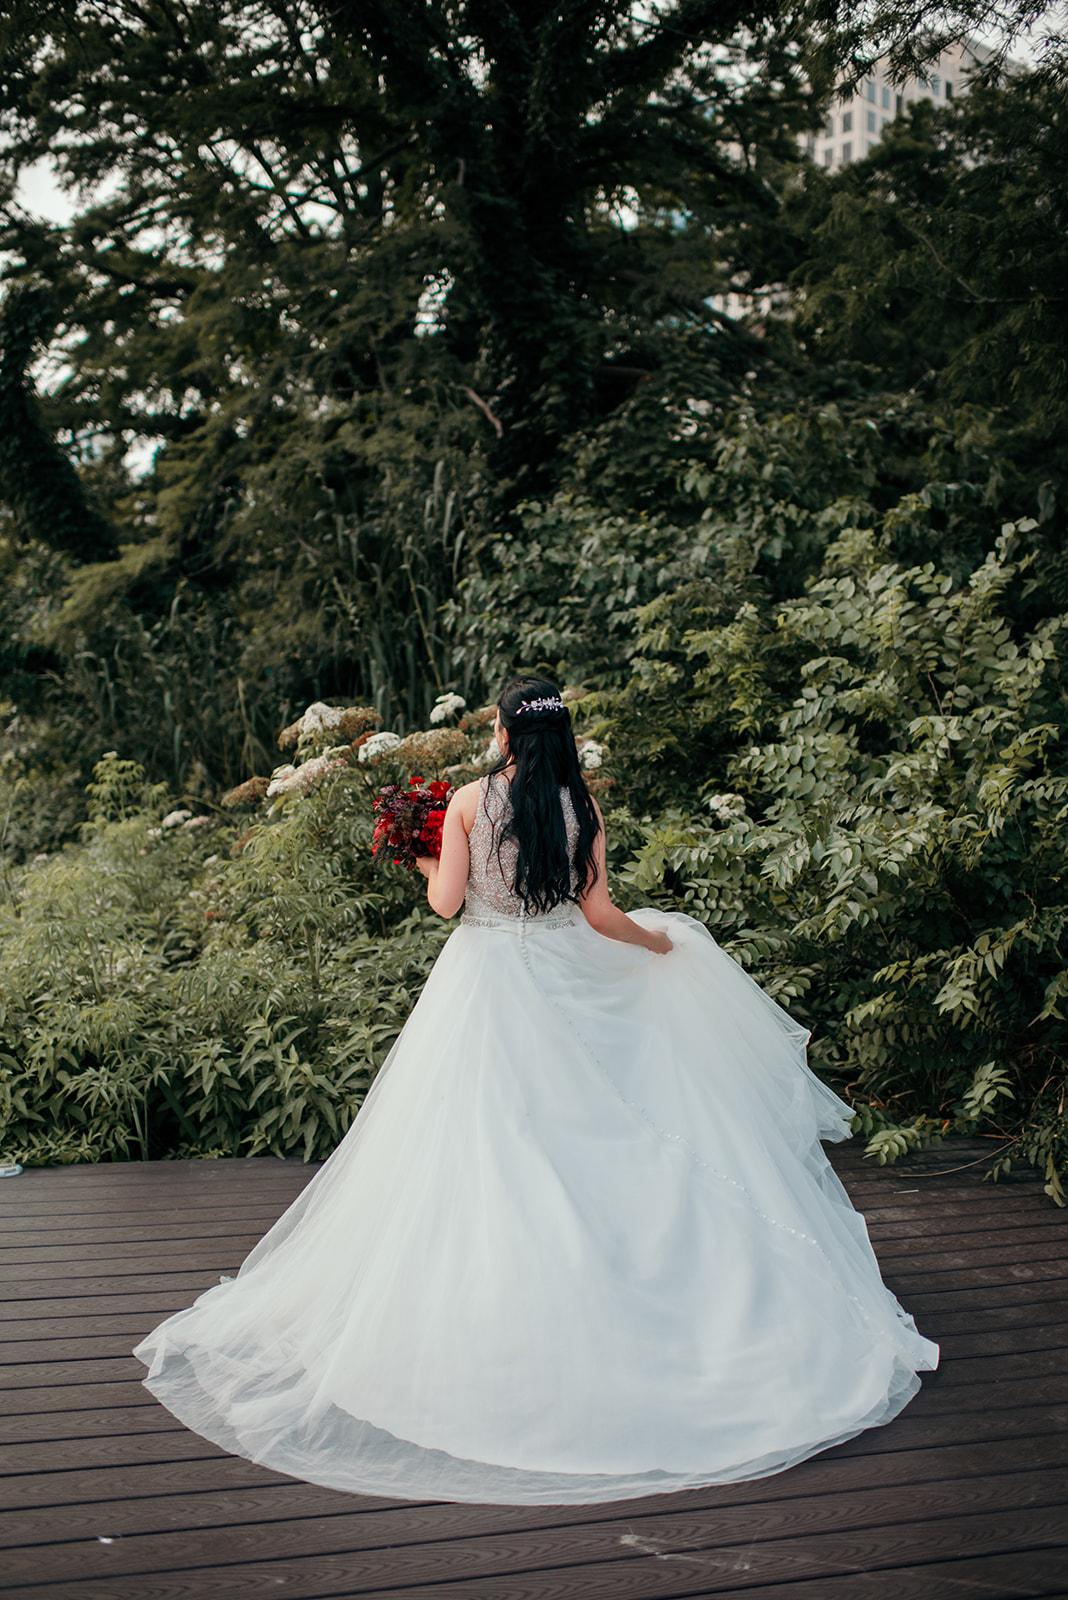 downtown-austin-wedding-dress.jpg